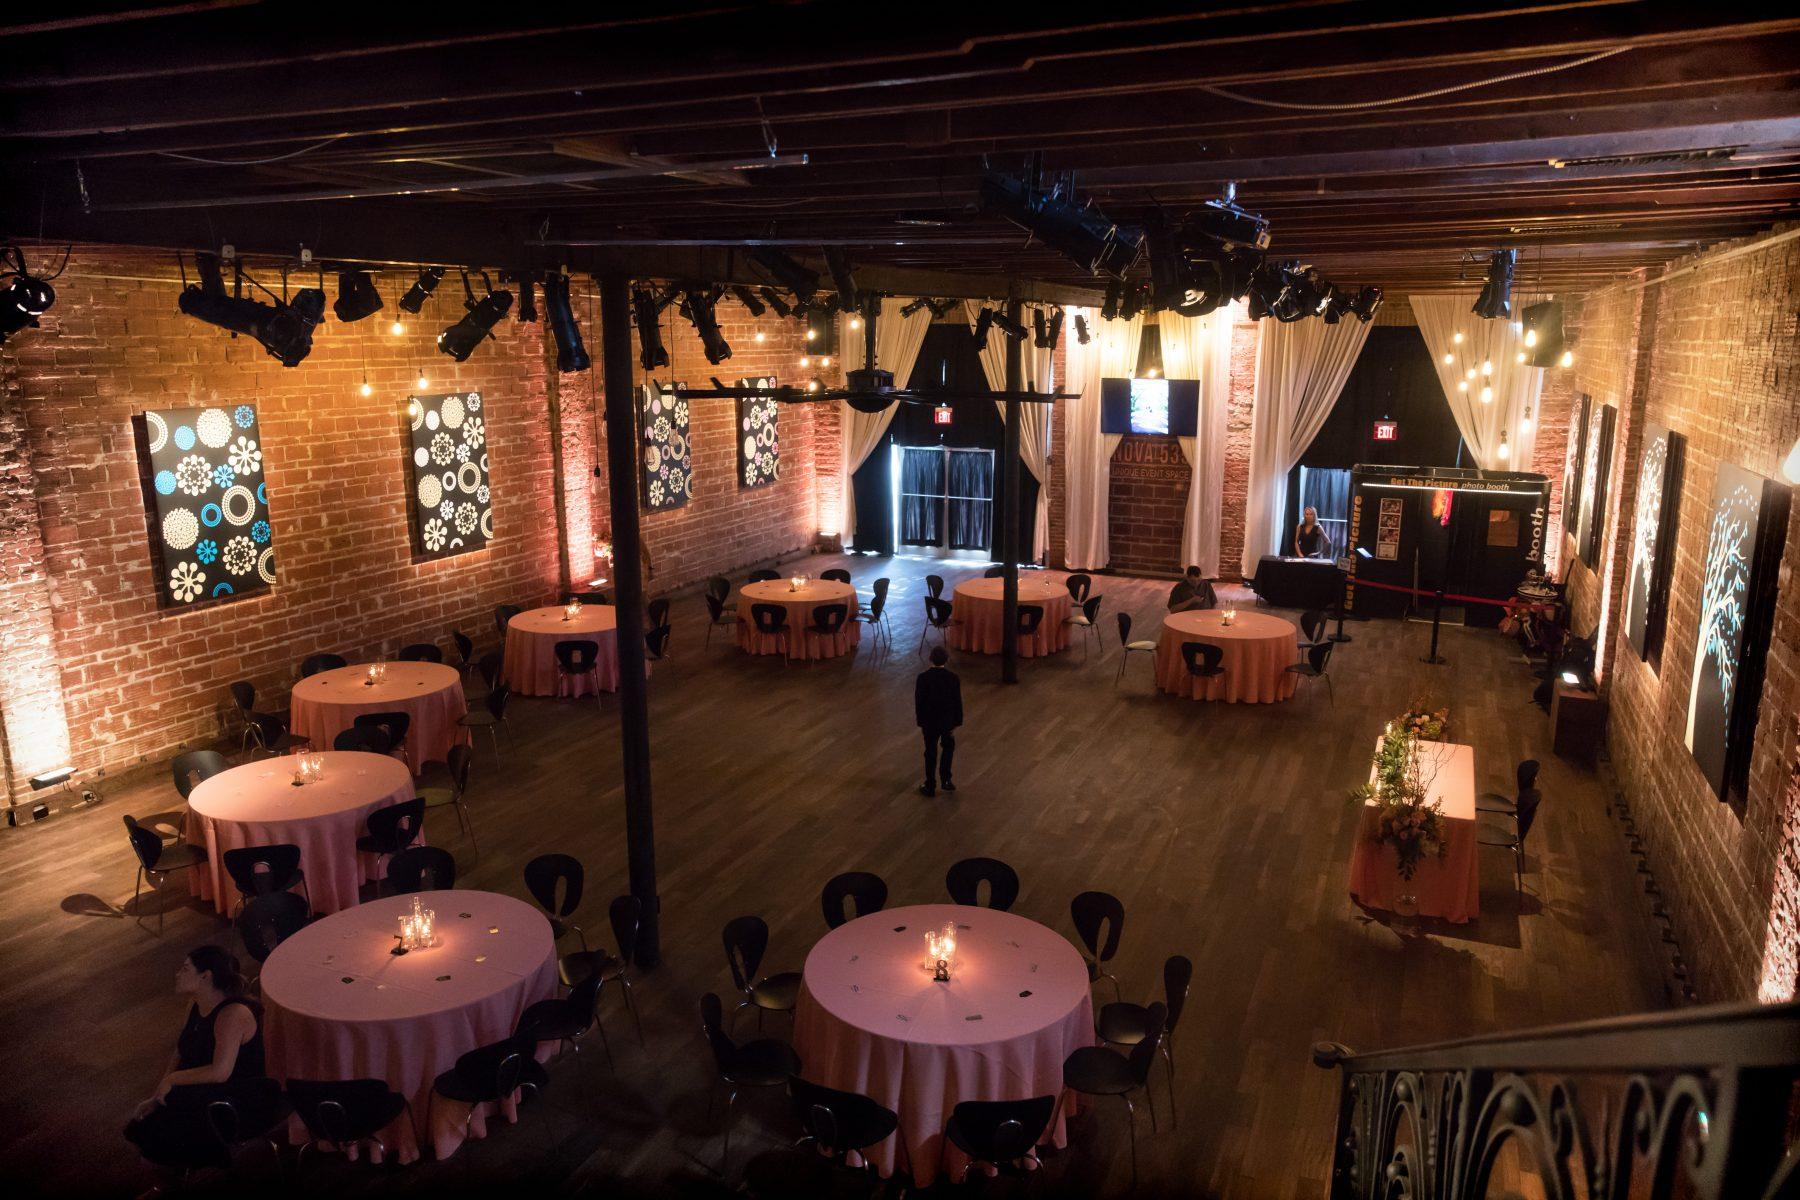 Minimalist Mauve wedding decor at reception, exposed red brick wall at Historic St. Pete Wedding Venue NOVA 535